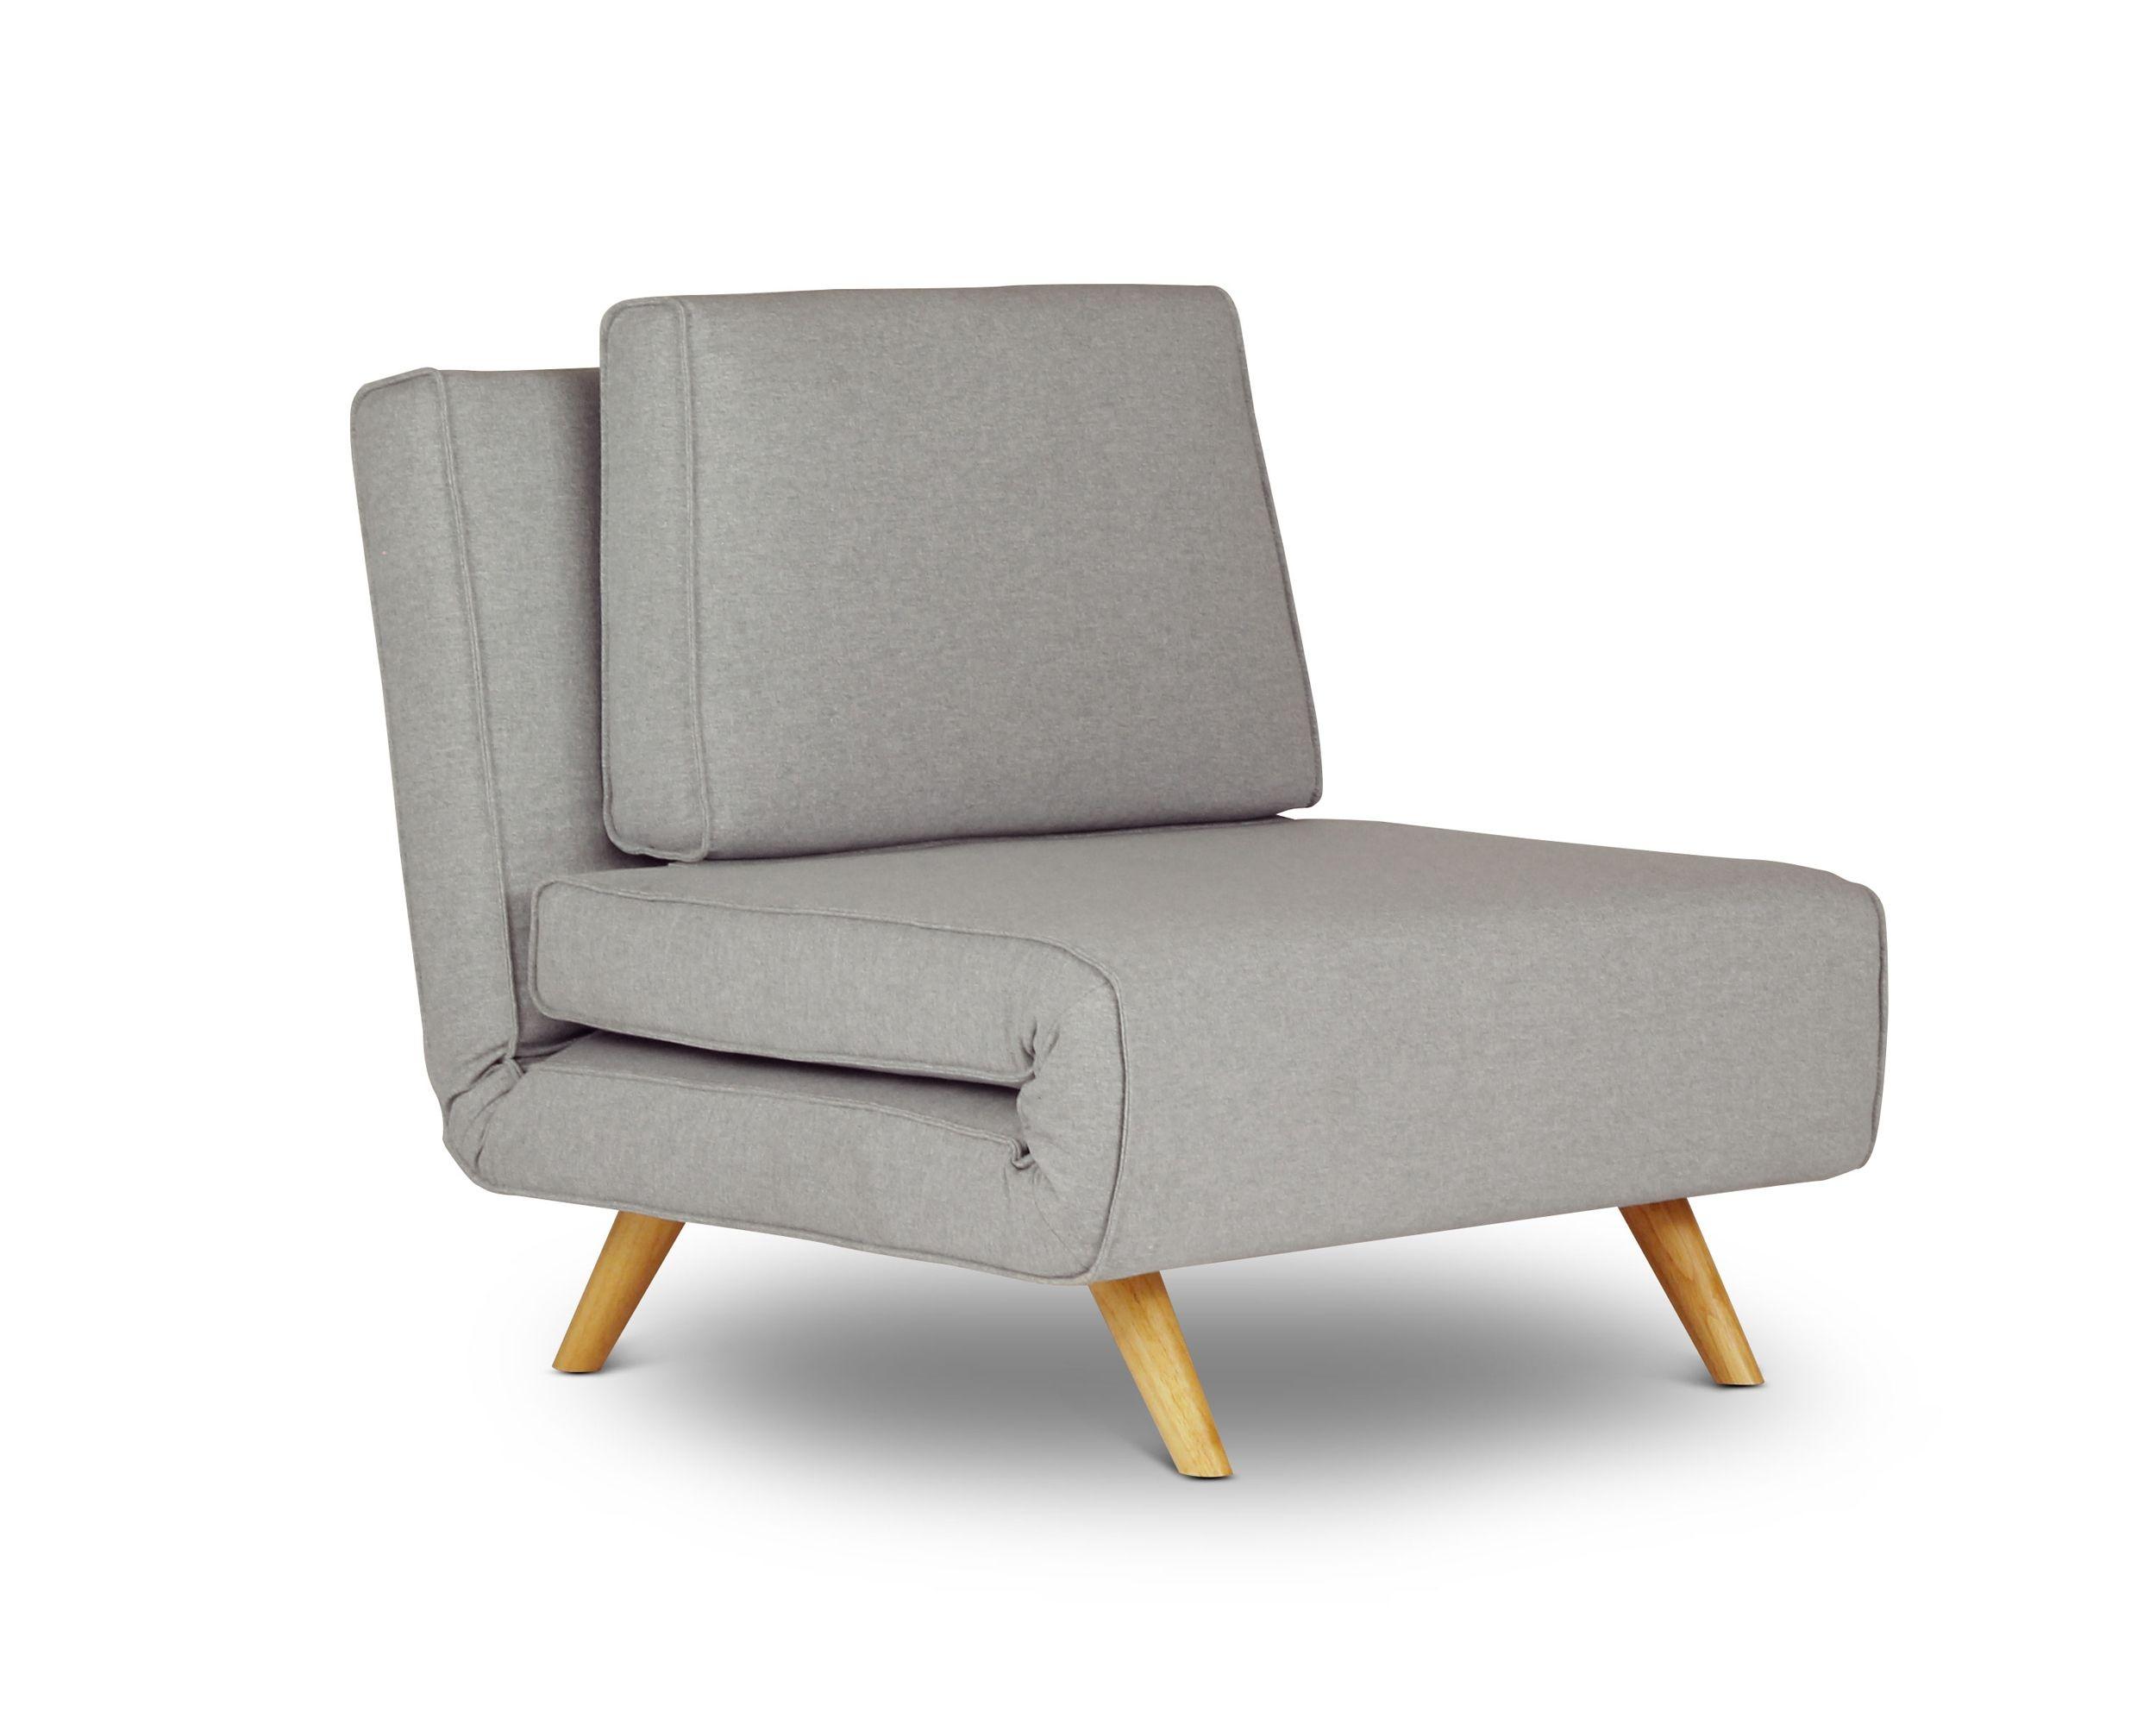 single sofa bed chair visual hunt rh visualhunt com single bed sofa bed single bed sofa sleeper